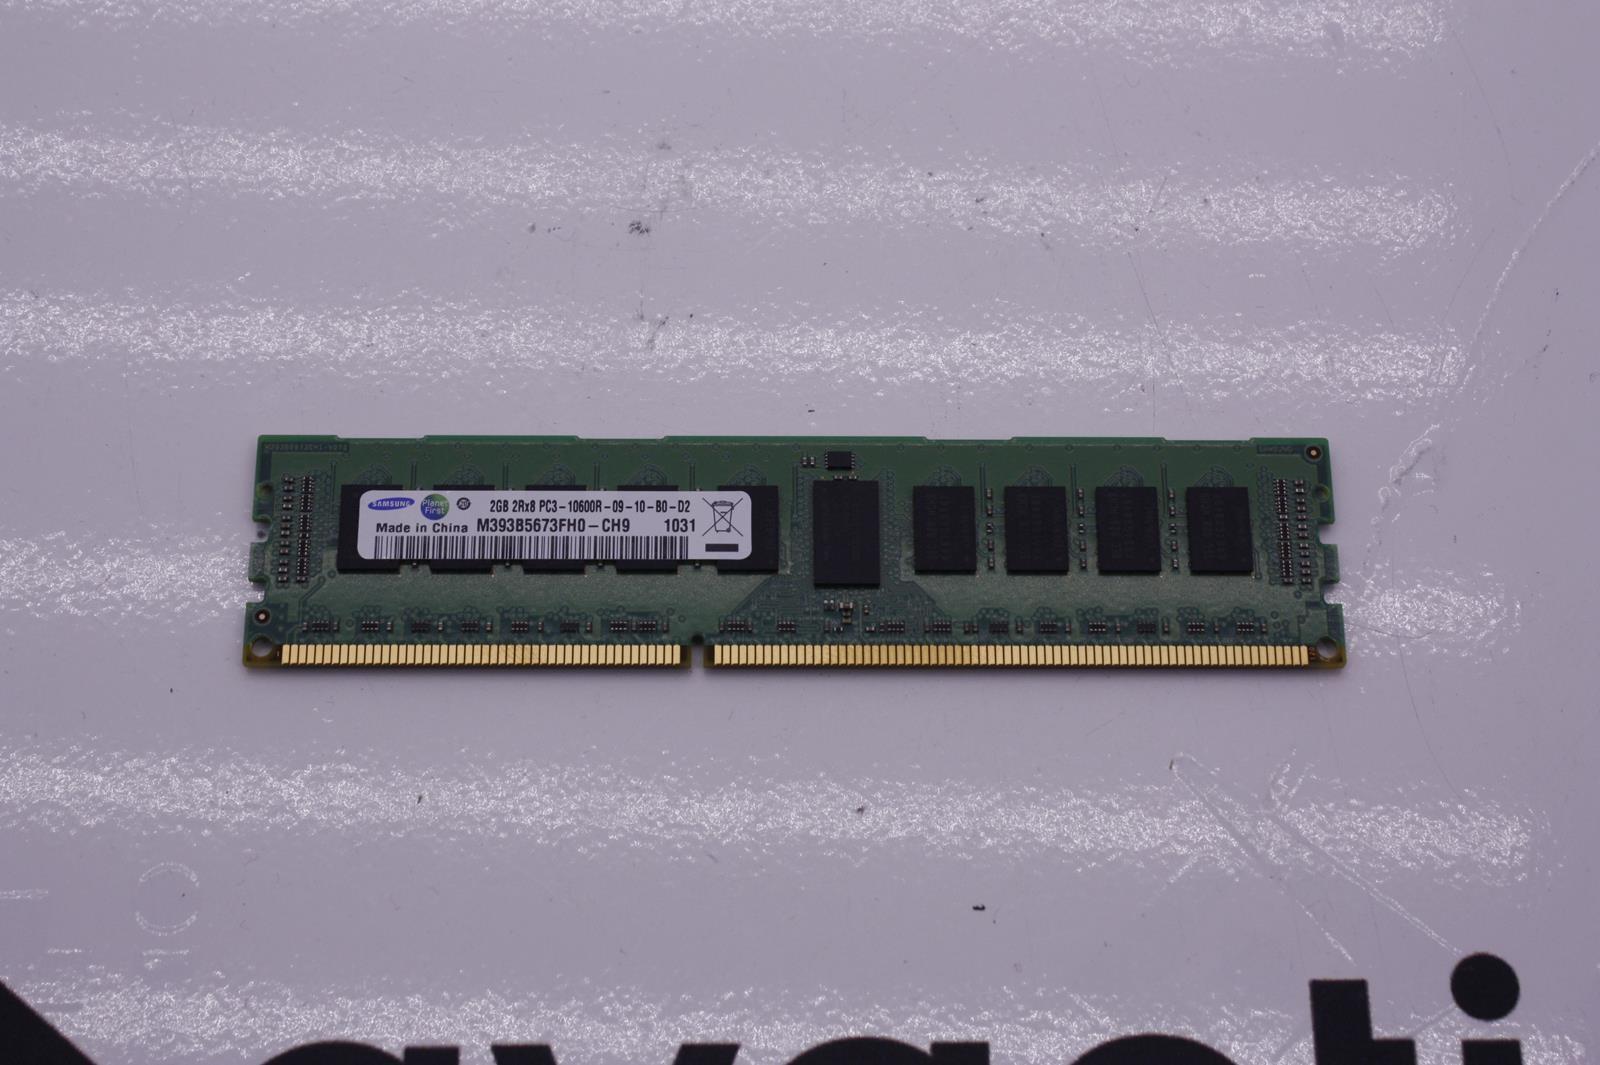 25140-M393B5673FH0-CH9_29541_base